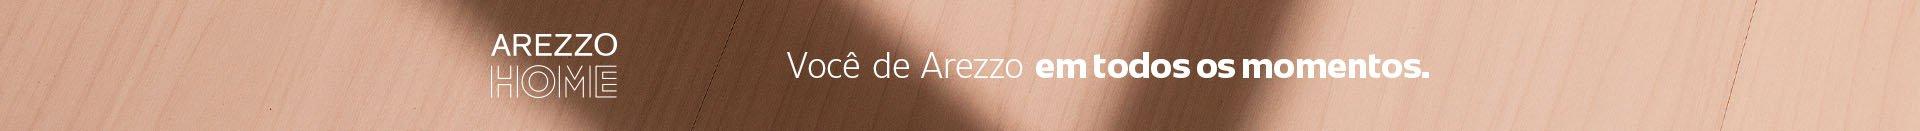 Banner-ArezzoHome-categoria-desktop.jpg